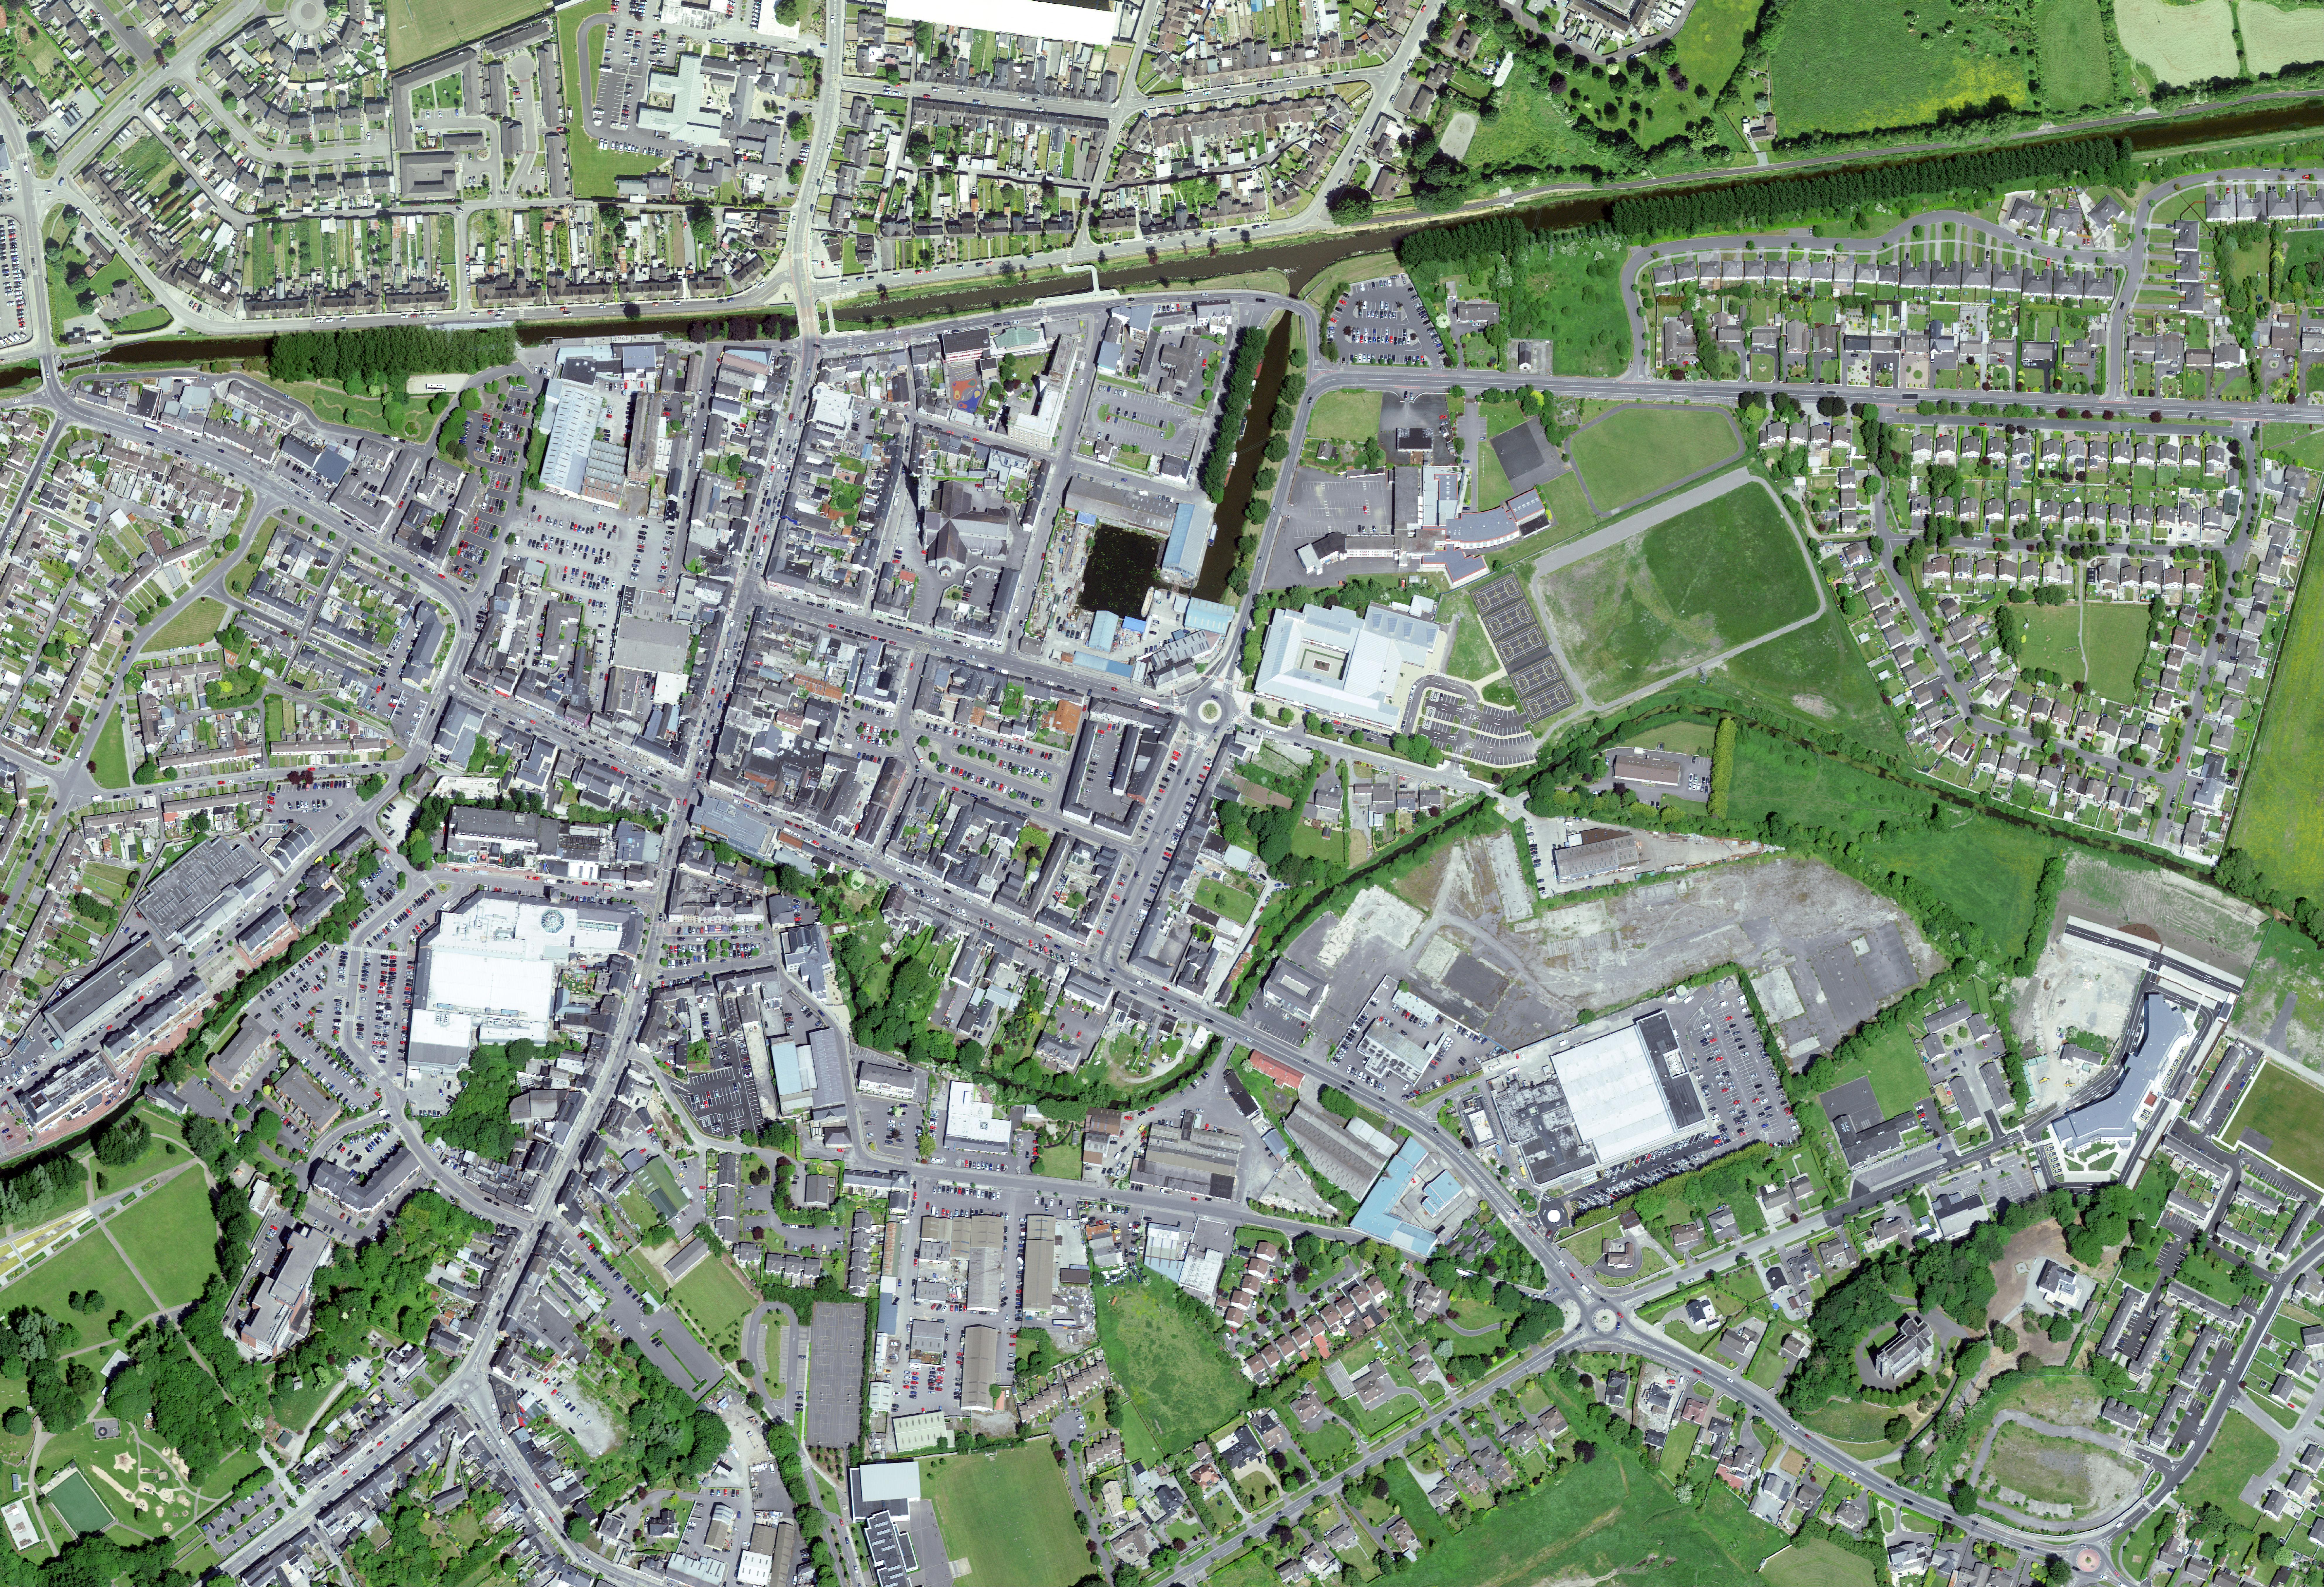 Aerial photo of Tullamore